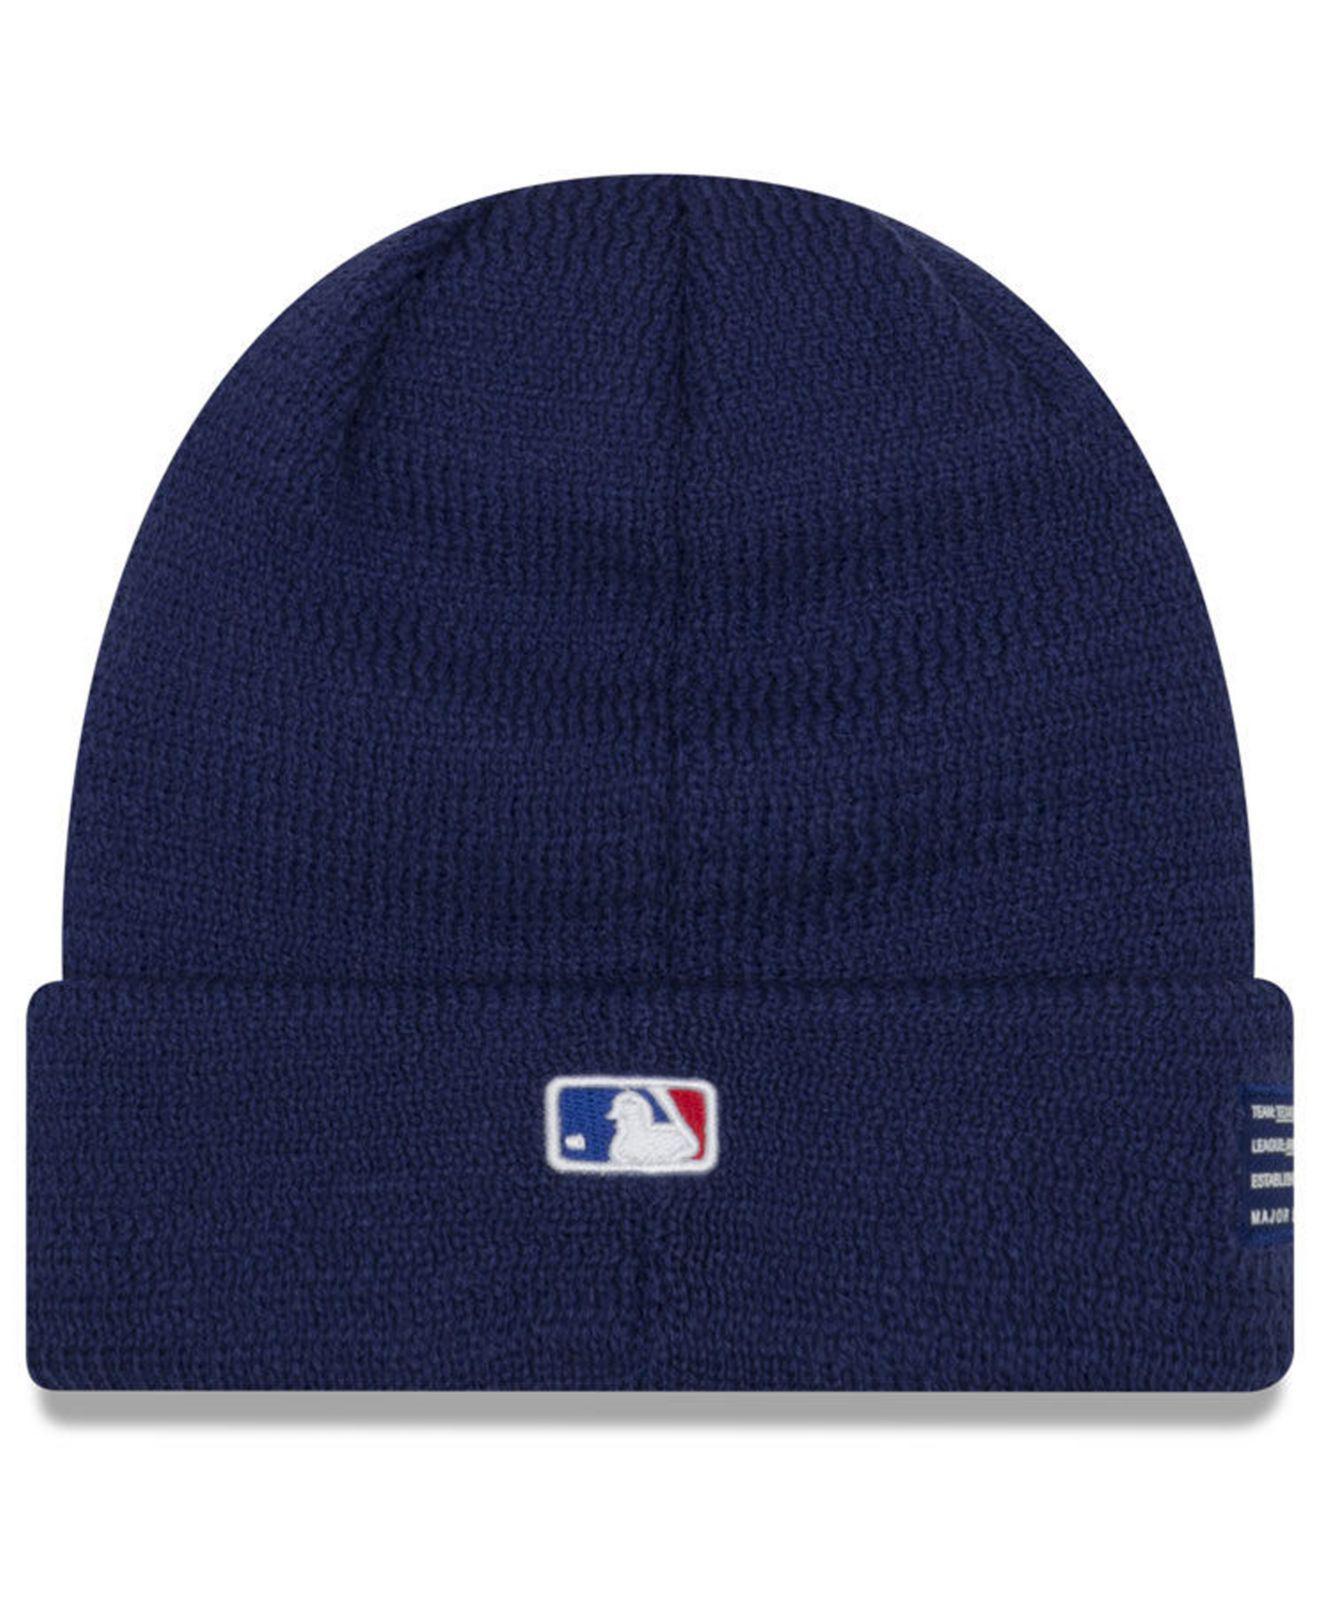 aec34fdbff9a18 Lyst - KTZ Texas Rangers Sport Knit Hat in Blue for Men